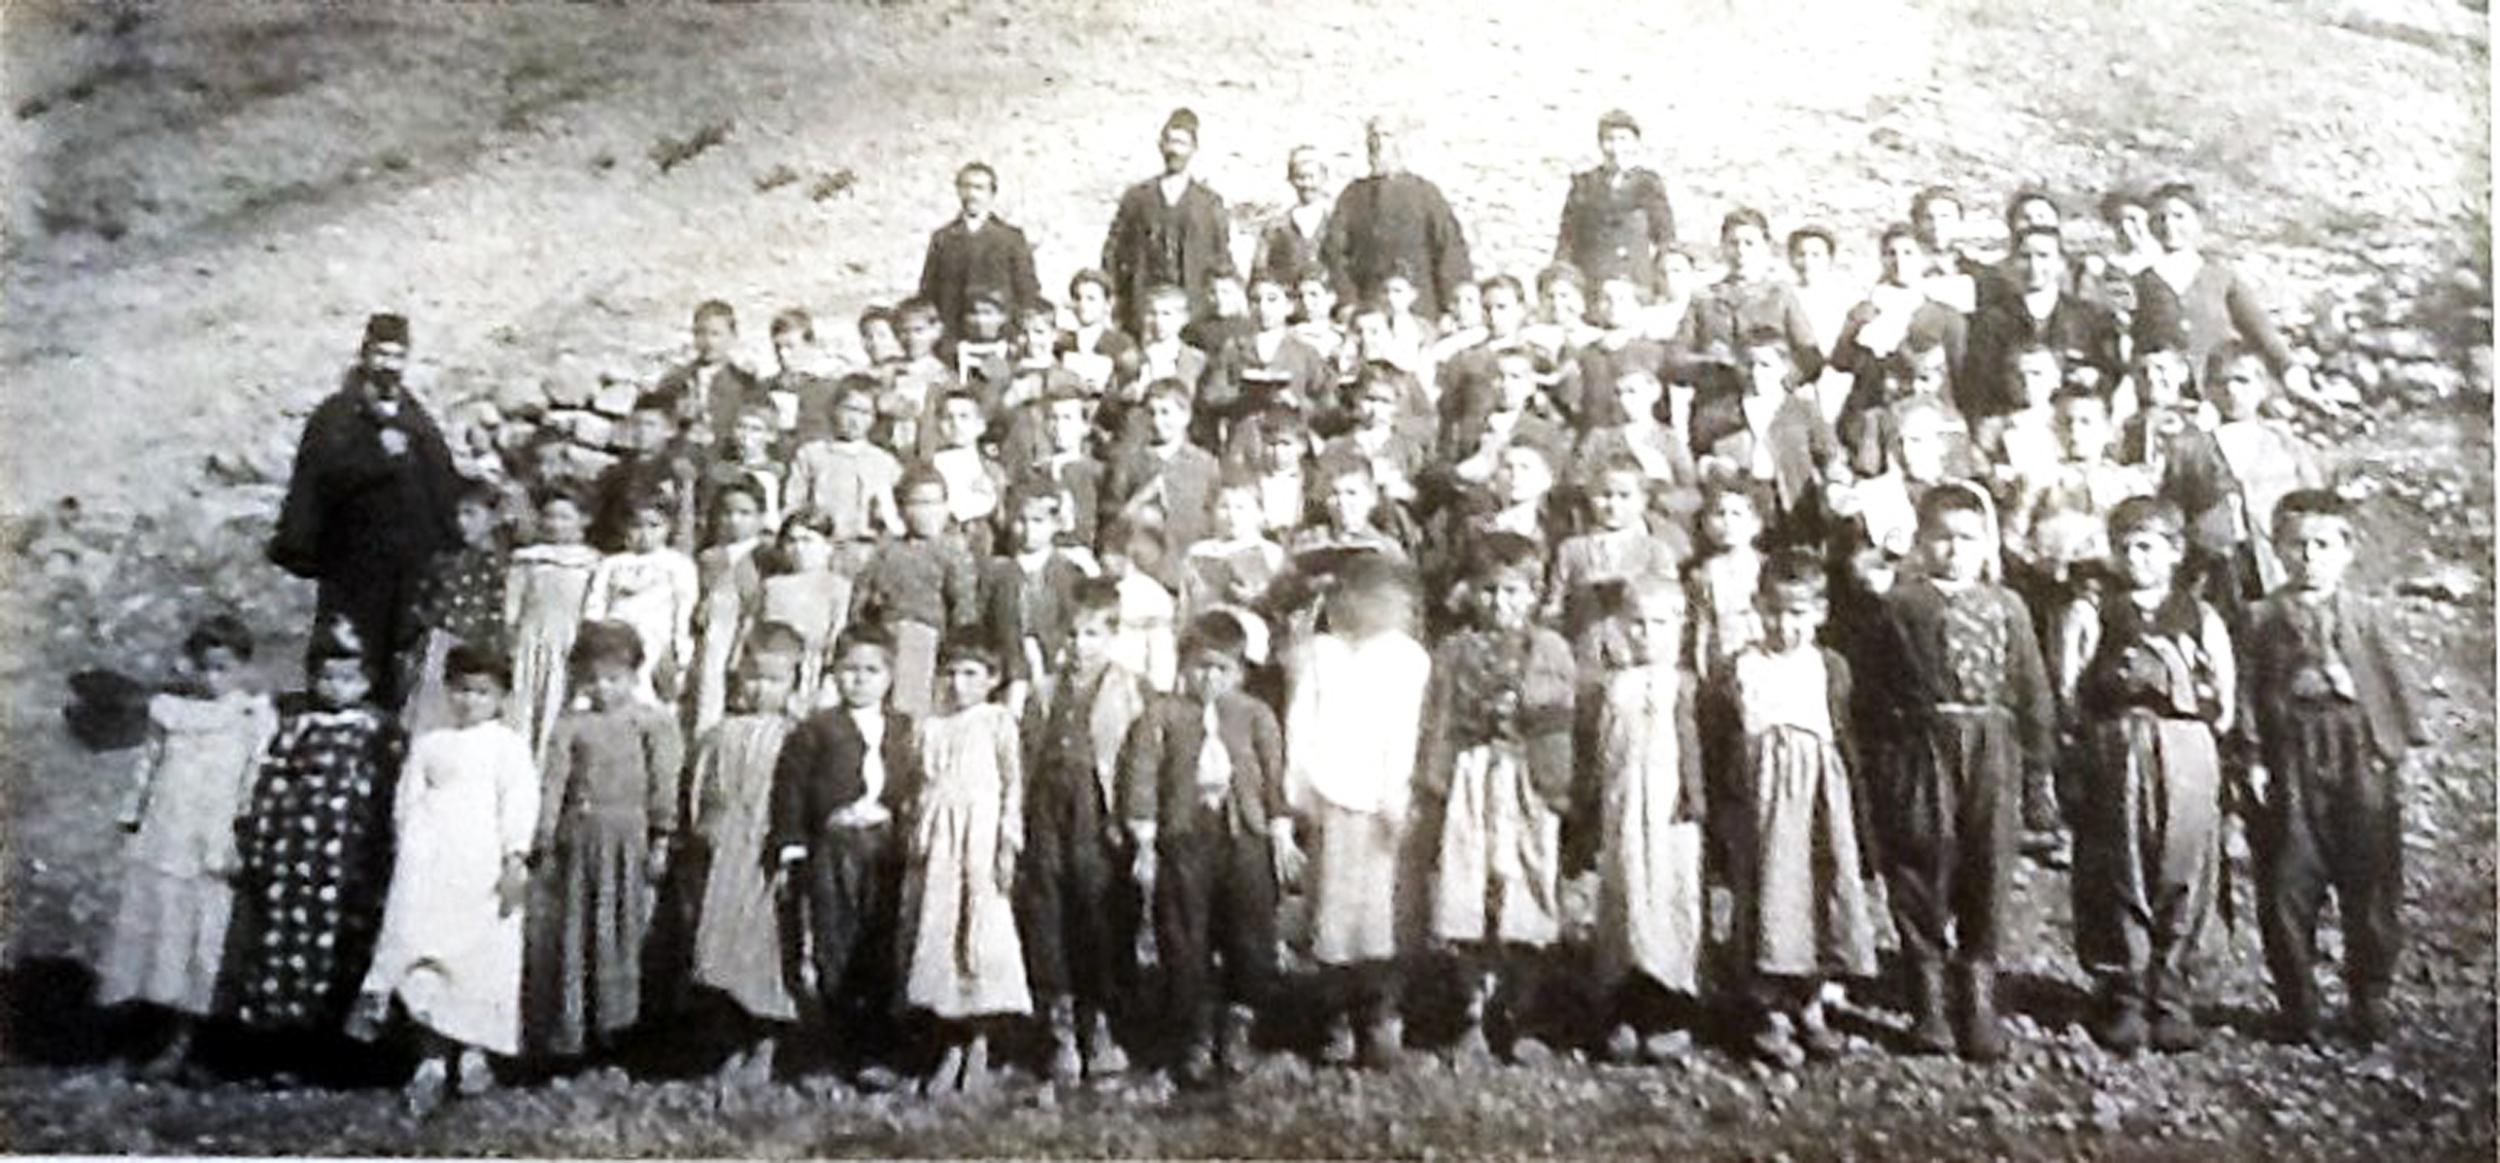 Adana Feke Hıristiyan Yetimhanesi.jpg